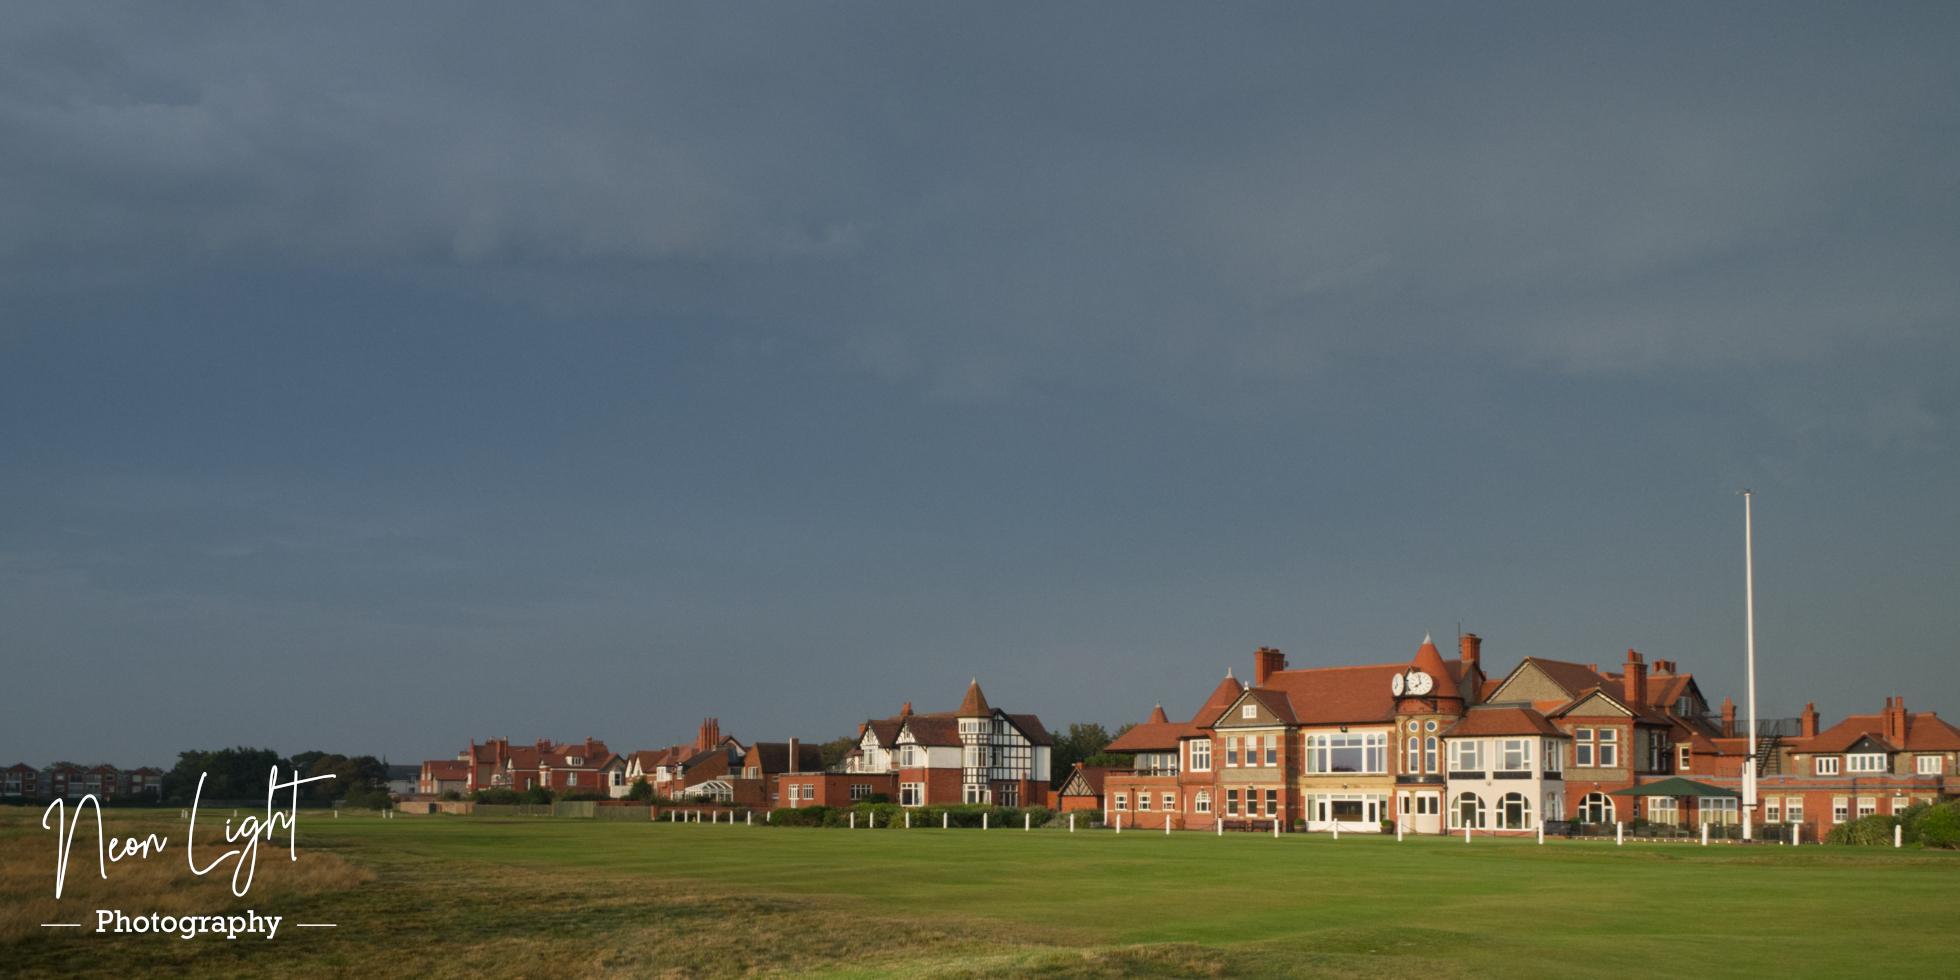 Evening Sun on the Royal Liverpool Golf Club